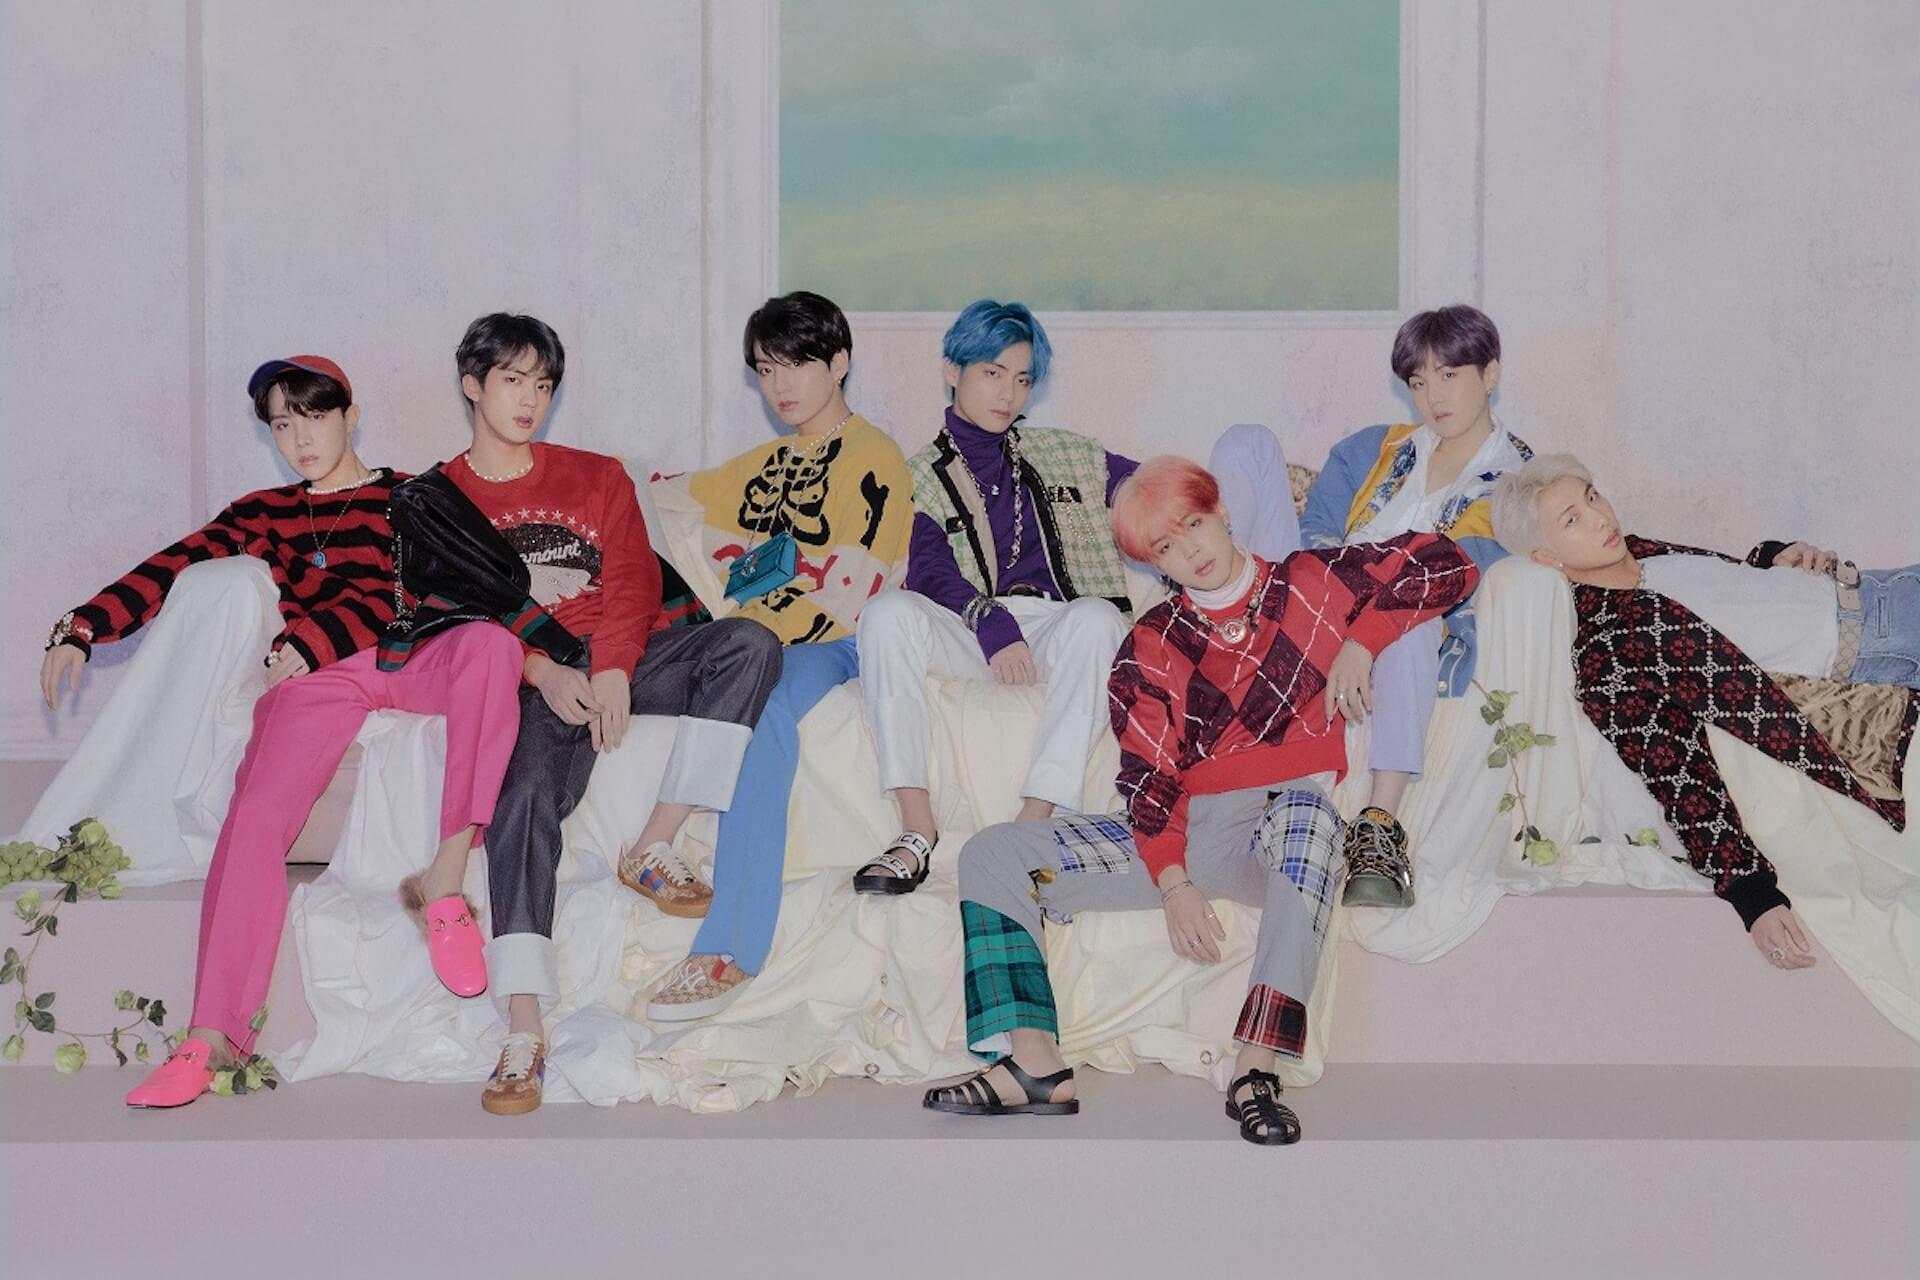 BTSが新たな快挙!『MAP OF THE SOUL : 7』受注数342万枚突破|BTS史上最多受注数記録達成 music200116_bts_album_main